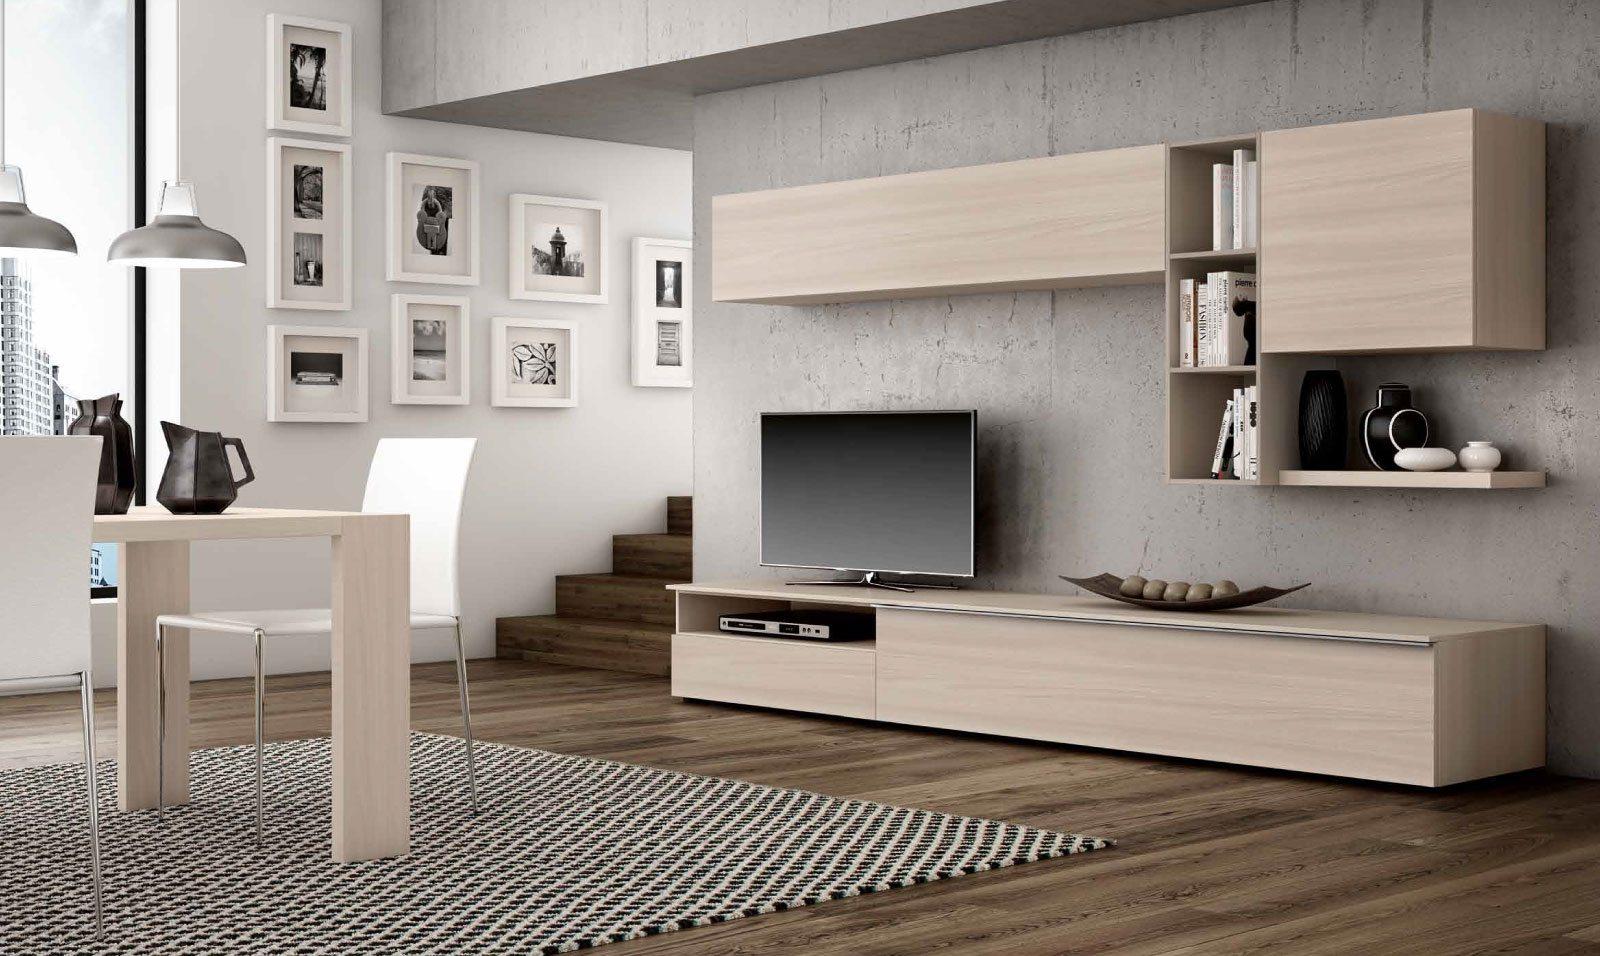 cuisiniste vaucluse cuisine with cuisiniste vaucluse fabulous poseur de cuisine dans le. Black Bedroom Furniture Sets. Home Design Ideas